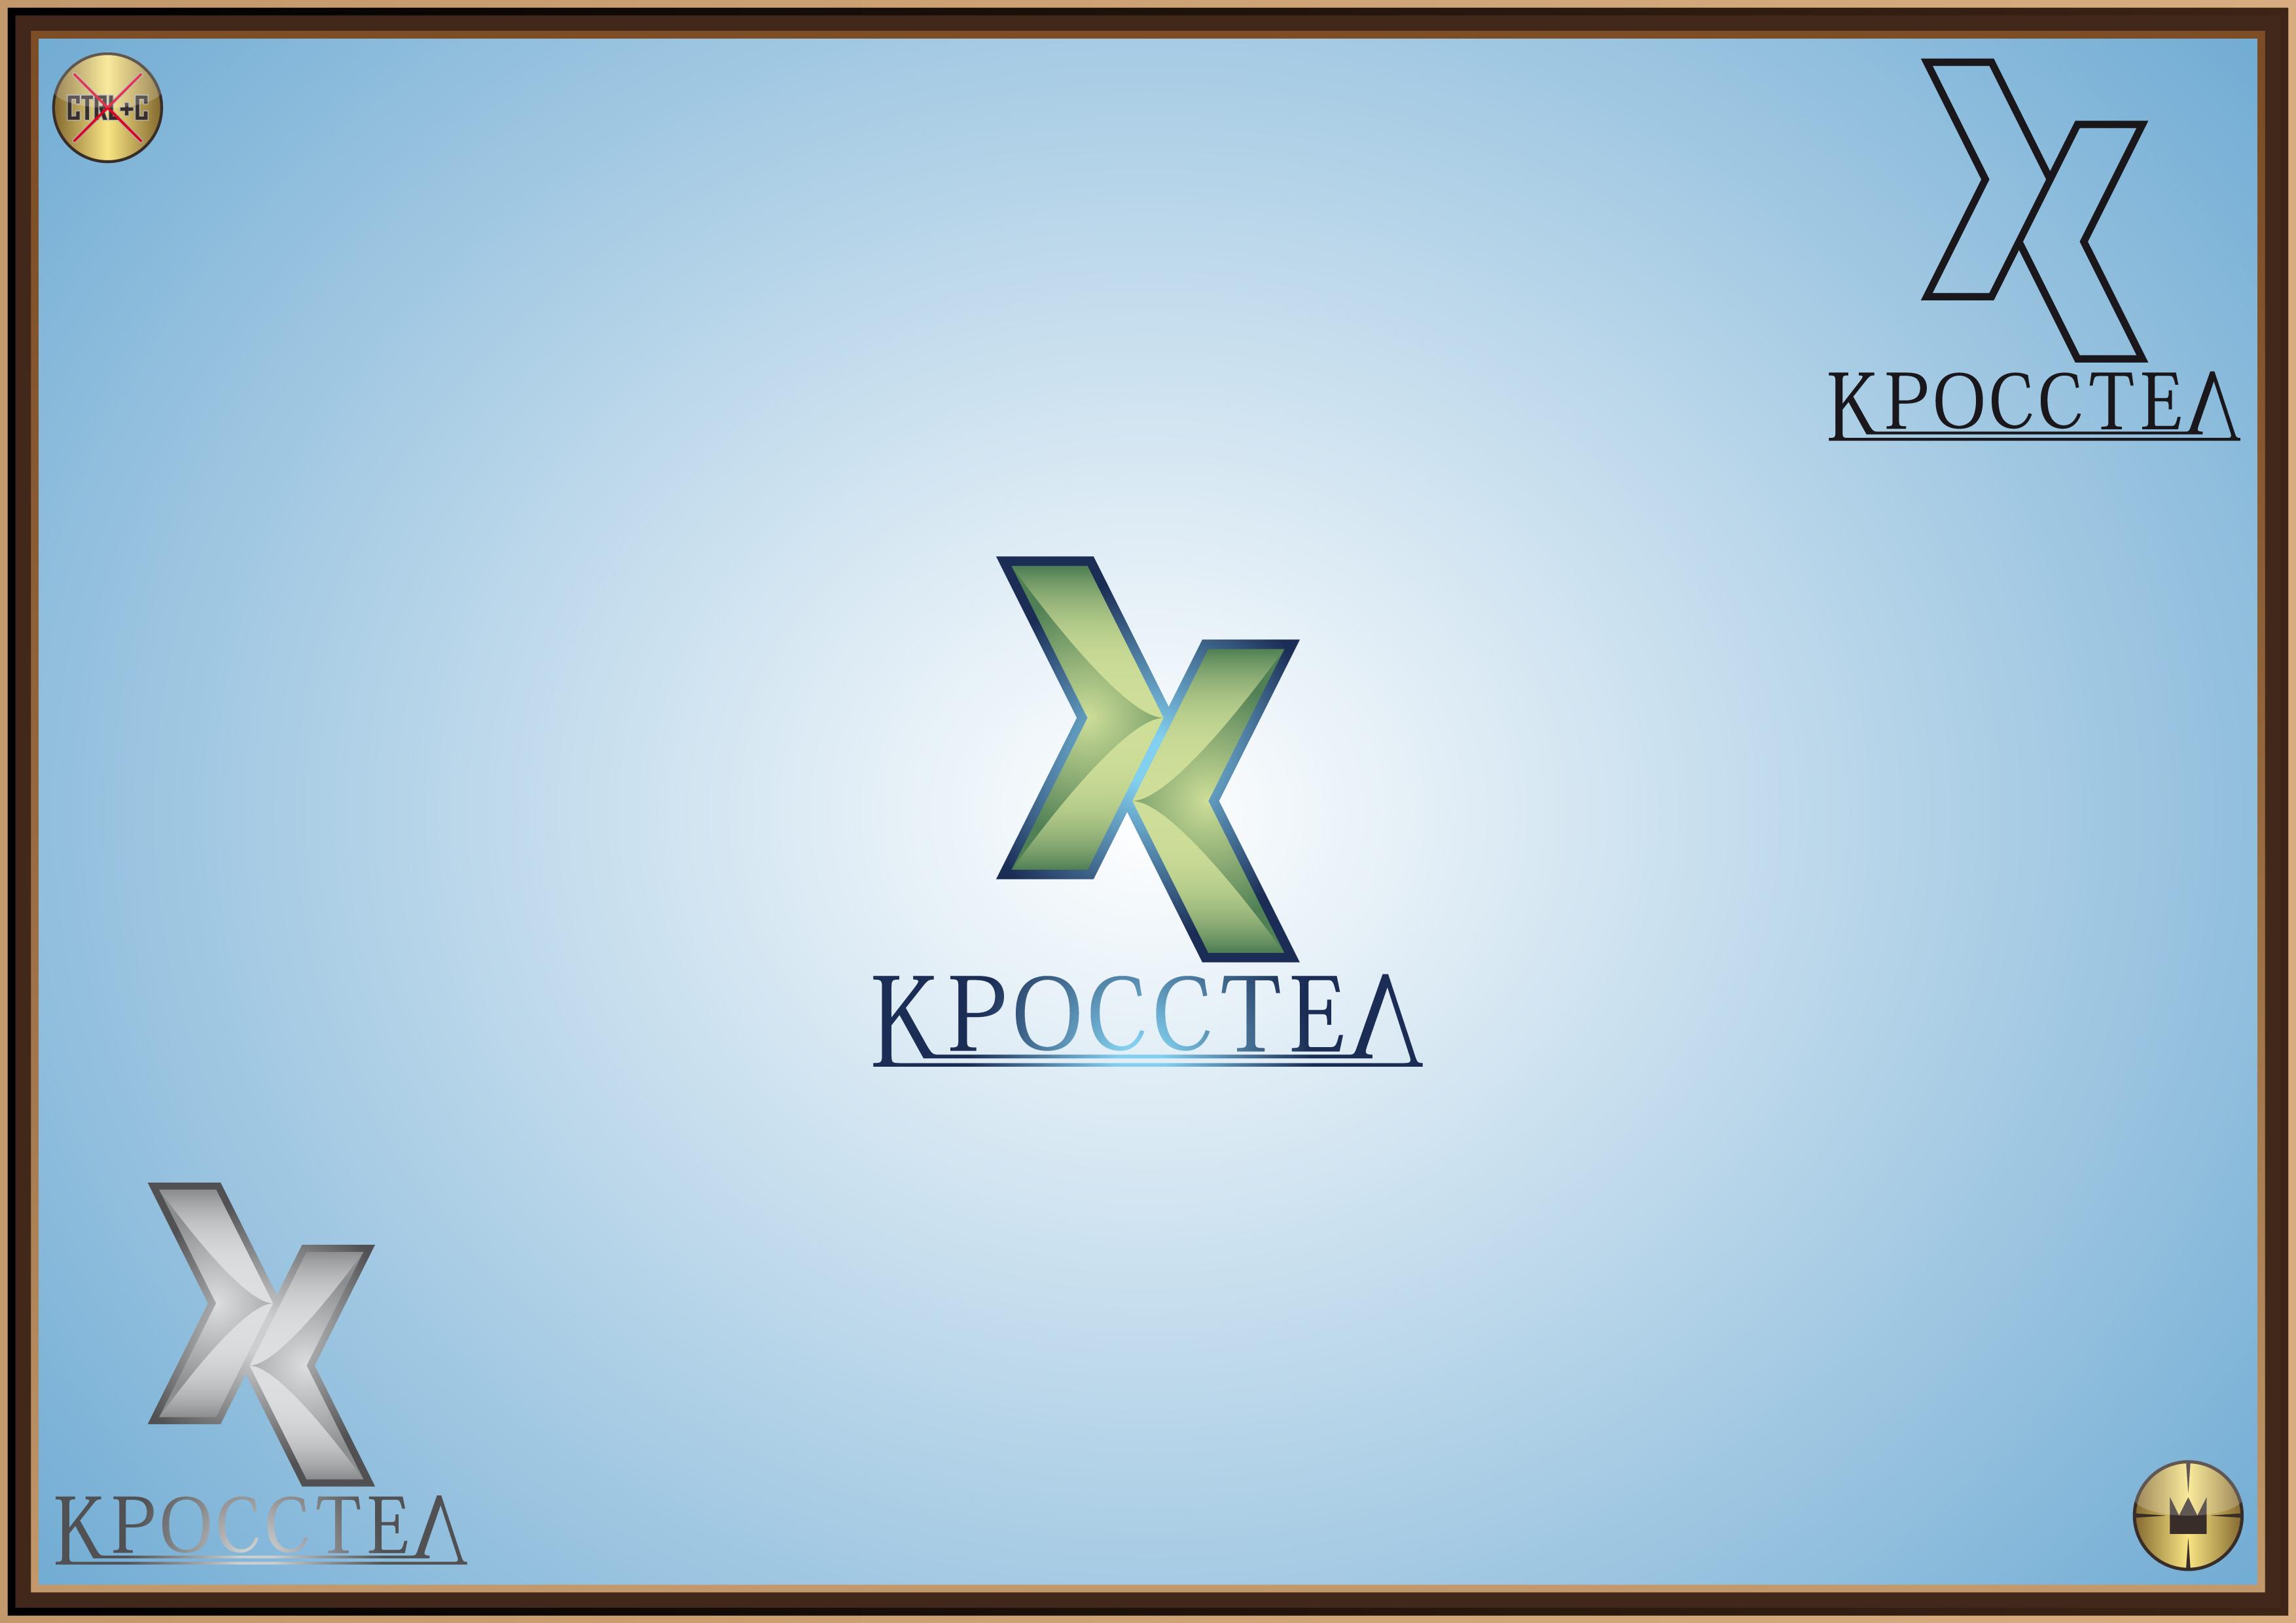 Логотип для компании оператора связи фото f_4ee874902f4ad.jpg